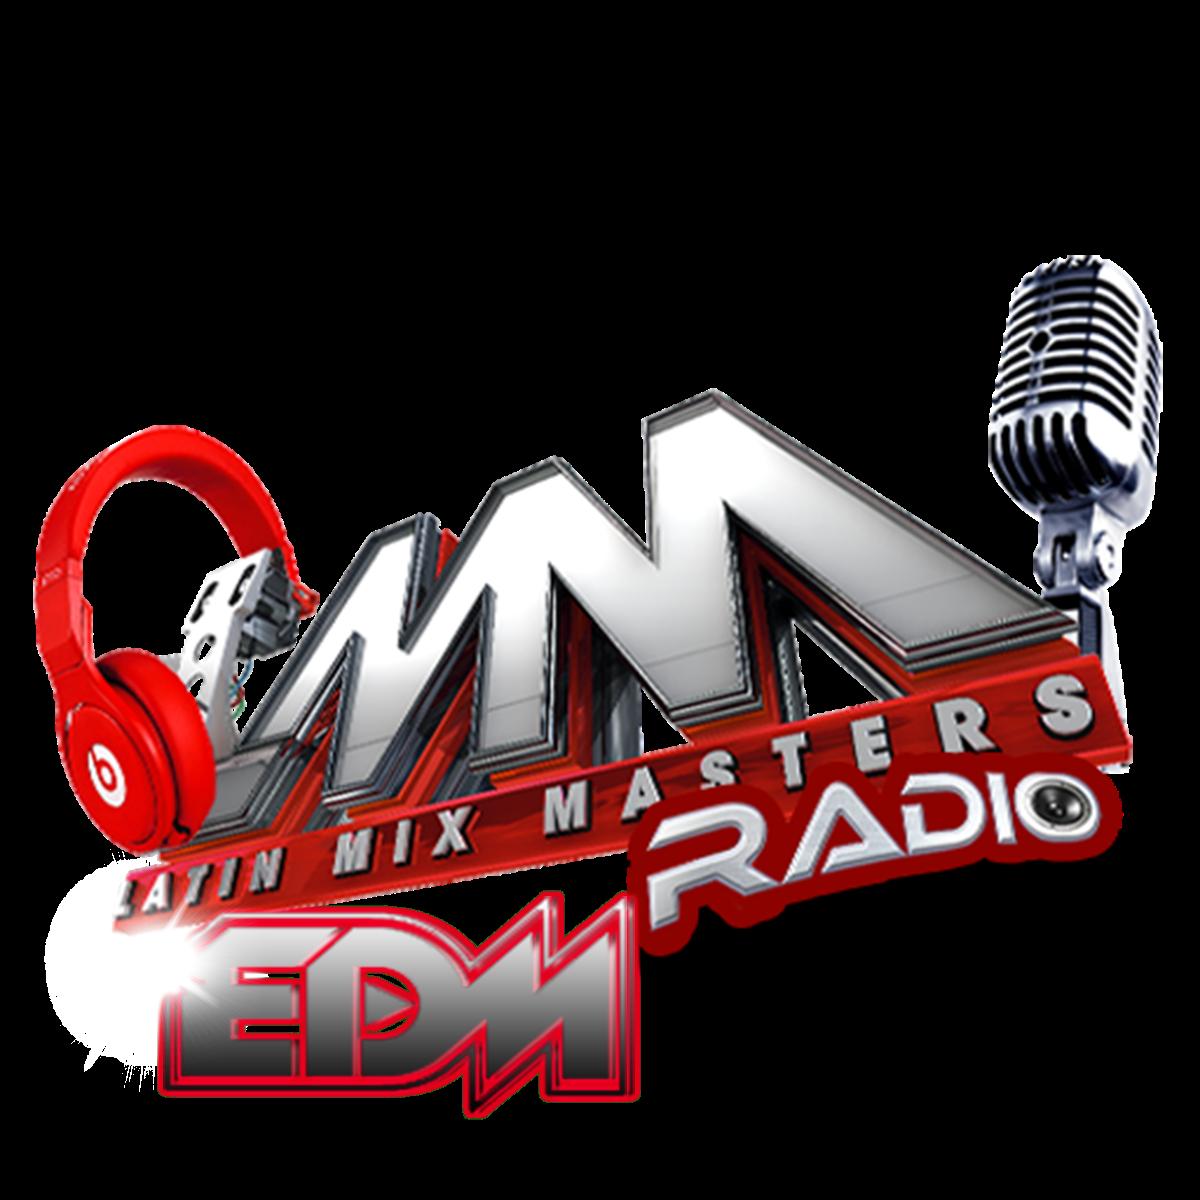 LMM EDM Radio - All About Music - Live Djs - MixMastersDjs.com